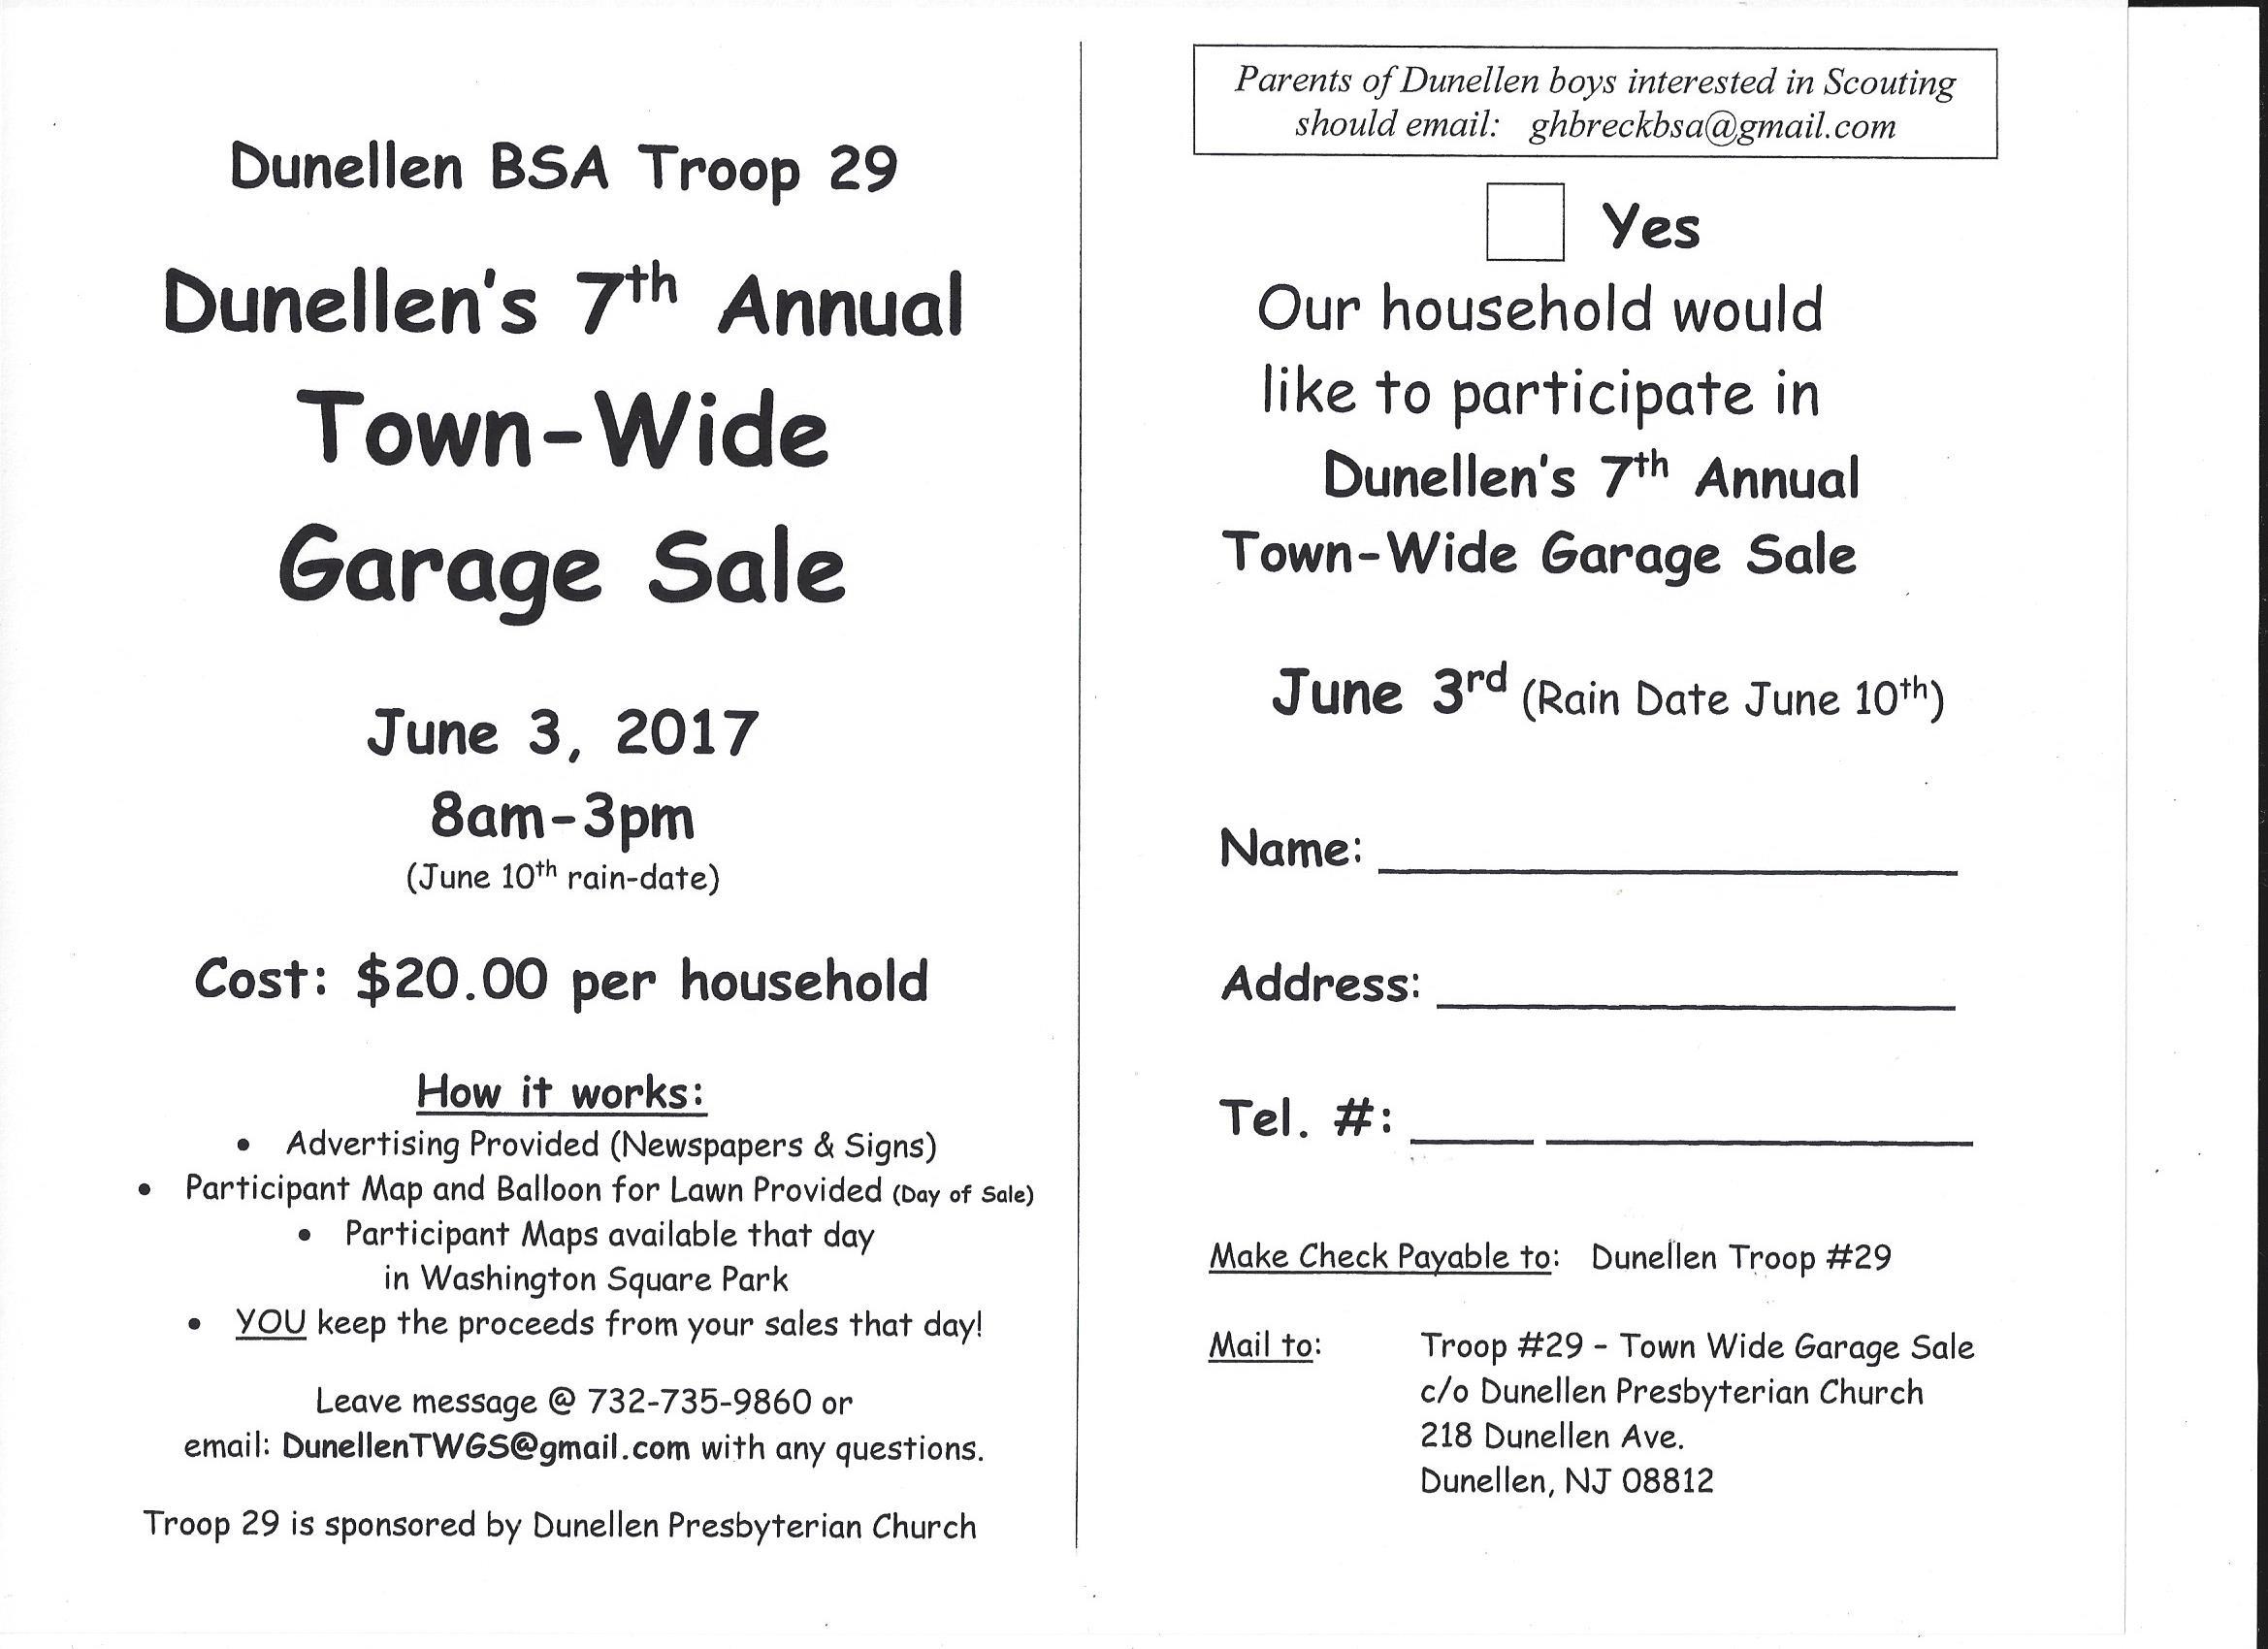 BSA Troop 29 Town-Wide Garage Sale